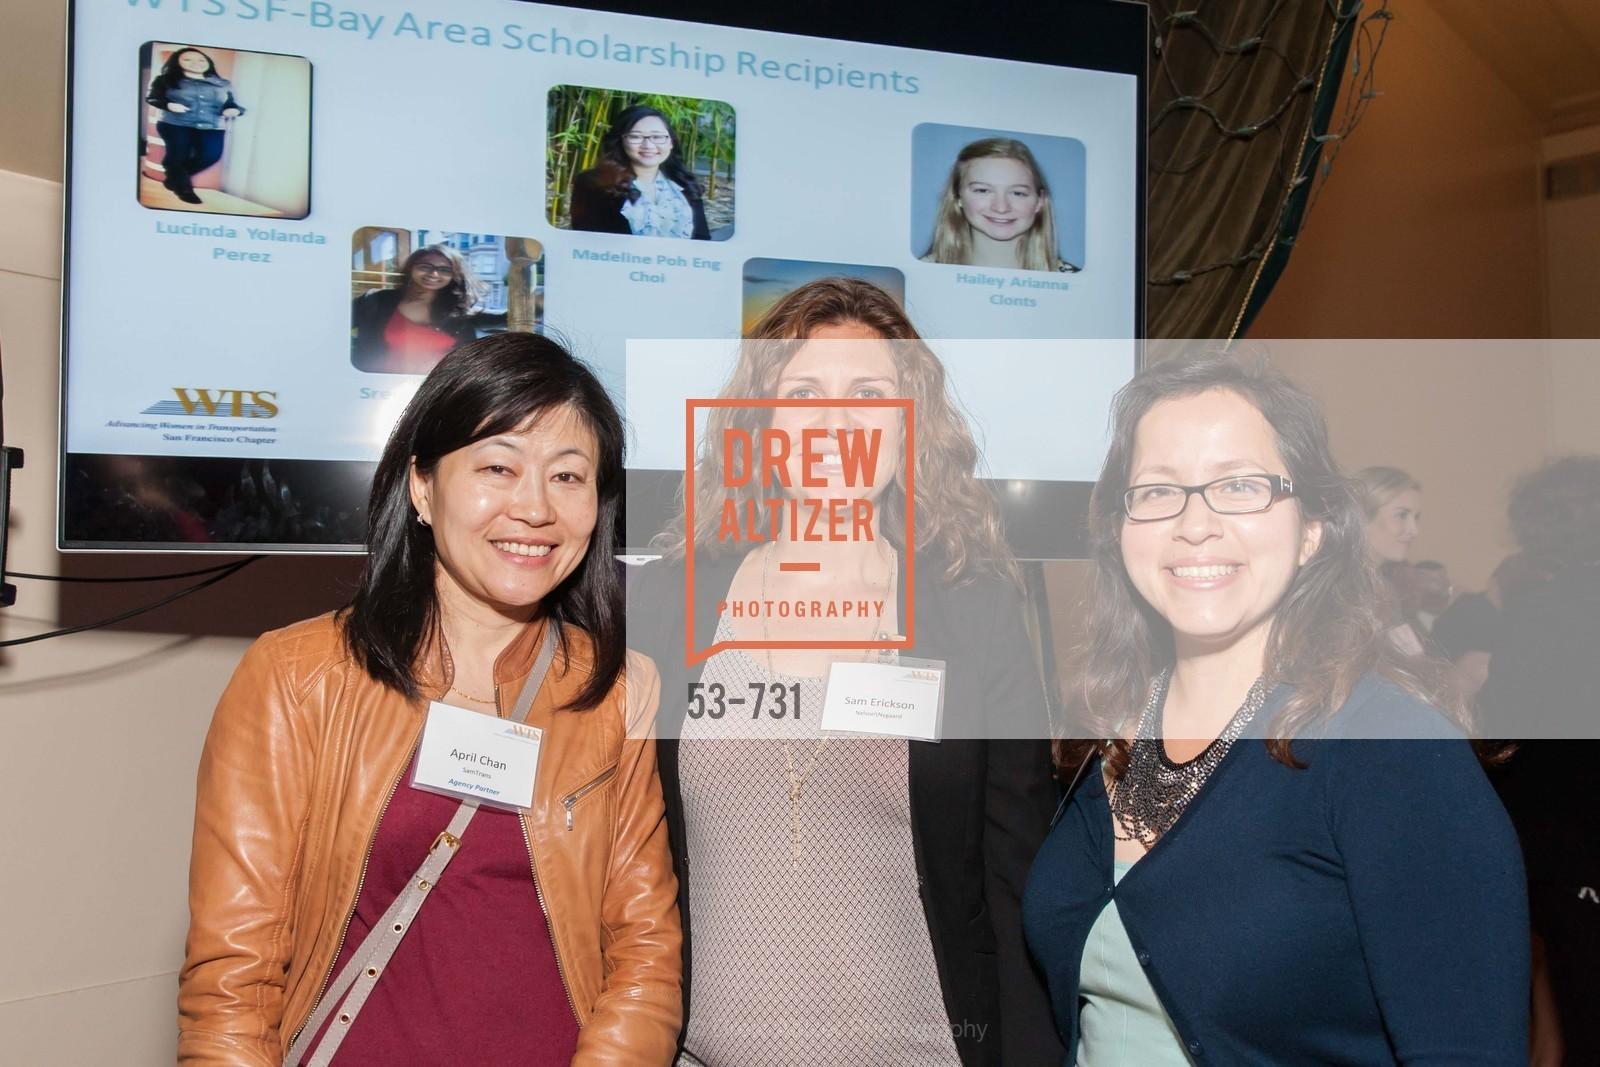 April Chan, Sam Erickson, Teresa Tapia, WOMEN'S TRANSPORTATION SEMINAR SF Bay Area Chapter Annual Scholarship Awards, US, May 15th, 2015,Drew Altizer, Drew Altizer Photography, full-service event agency, private events, San Francisco photographer, photographer California